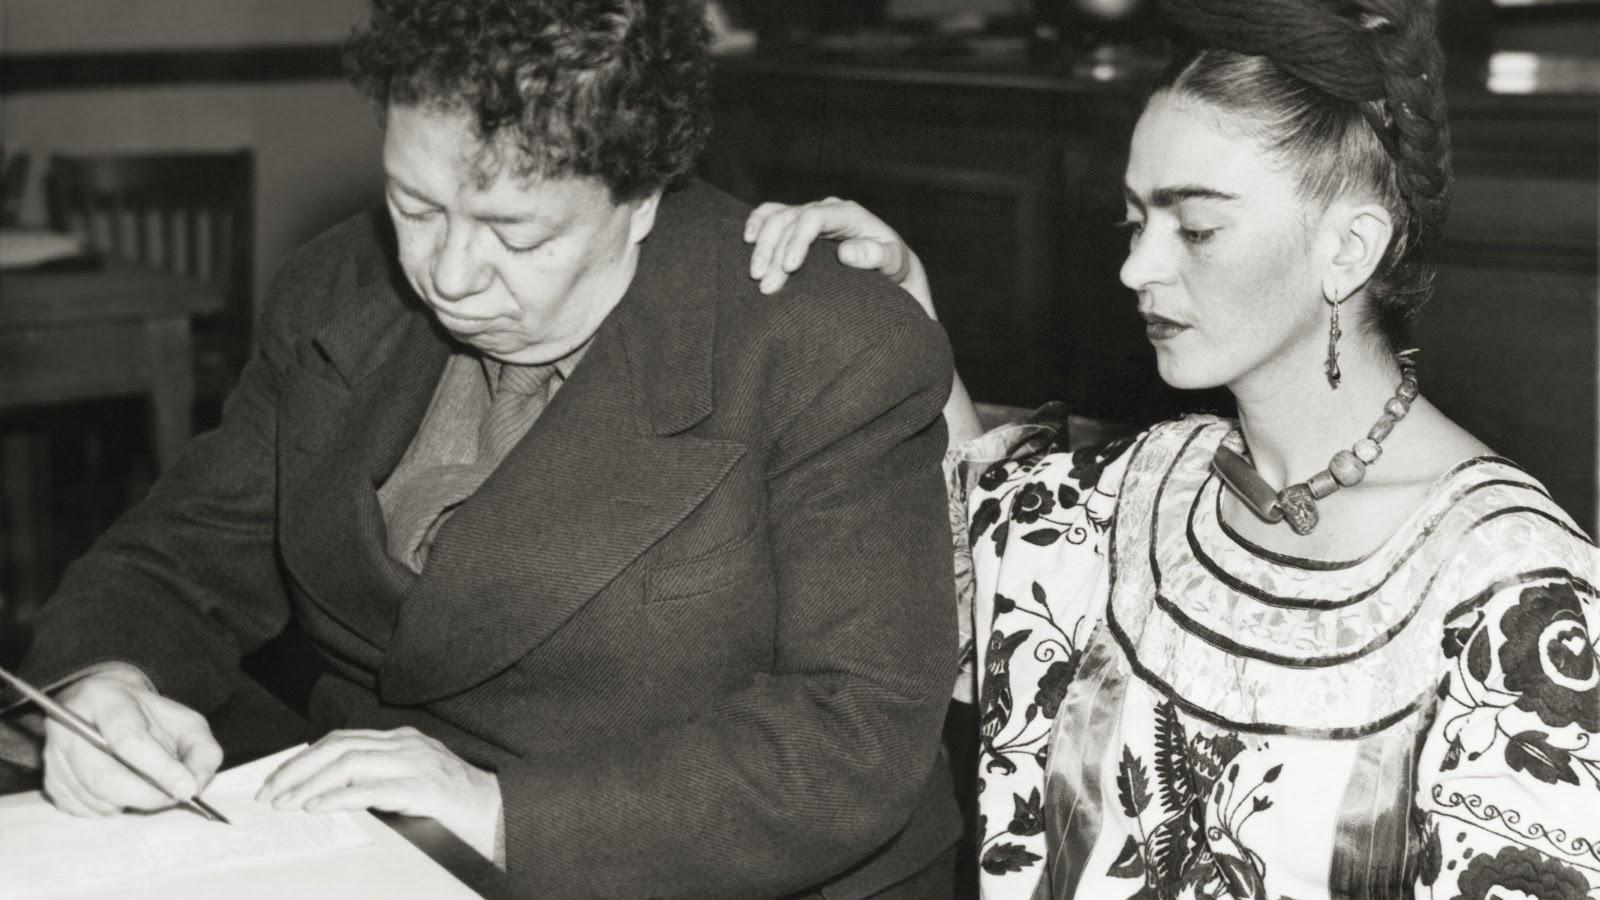 Diego Rivera y Frida Kahlo cartas eróticas